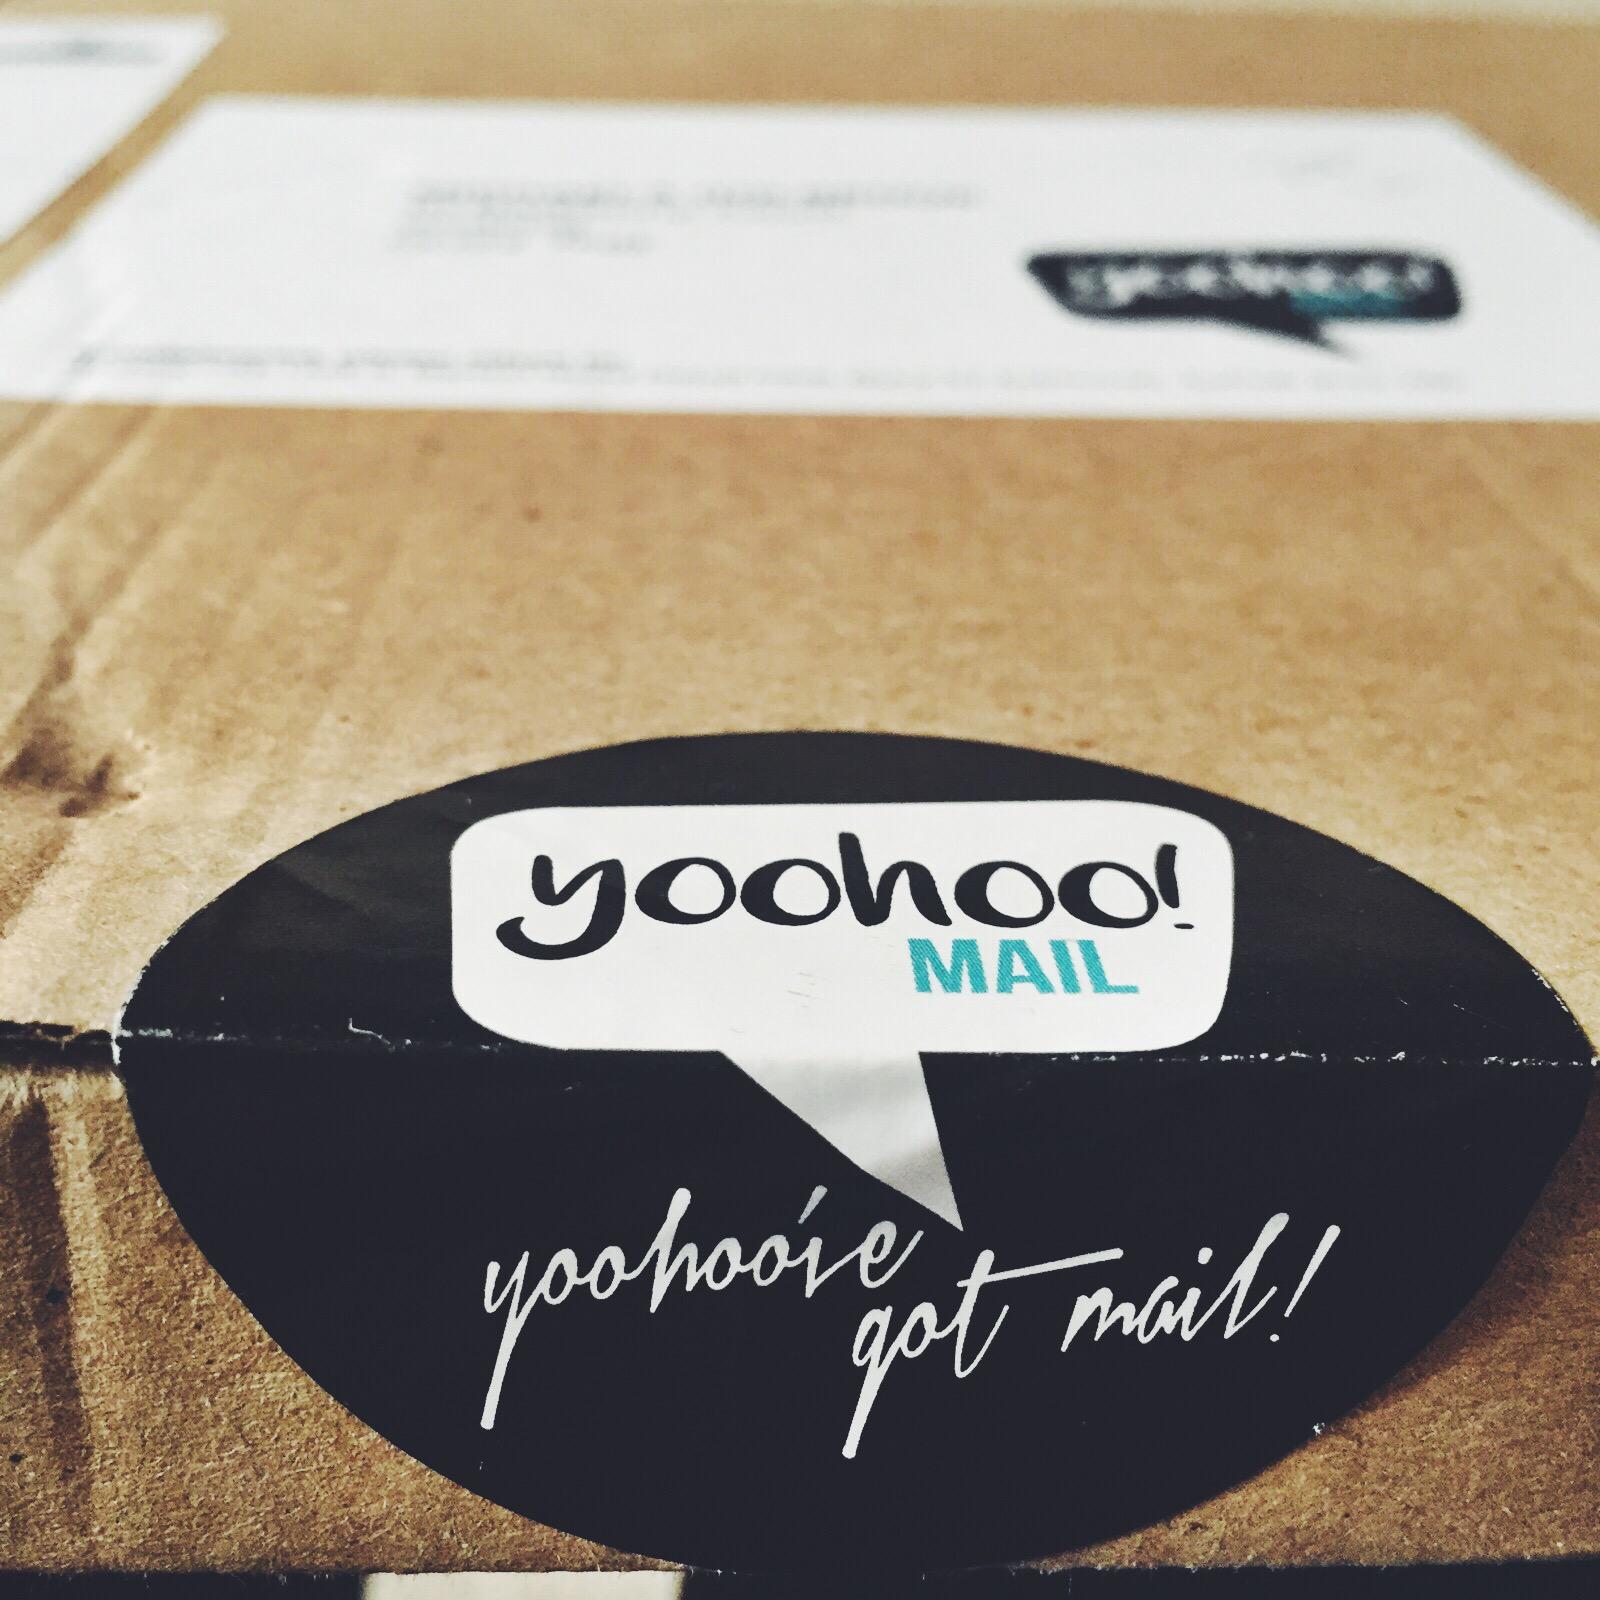 yoohoo mail